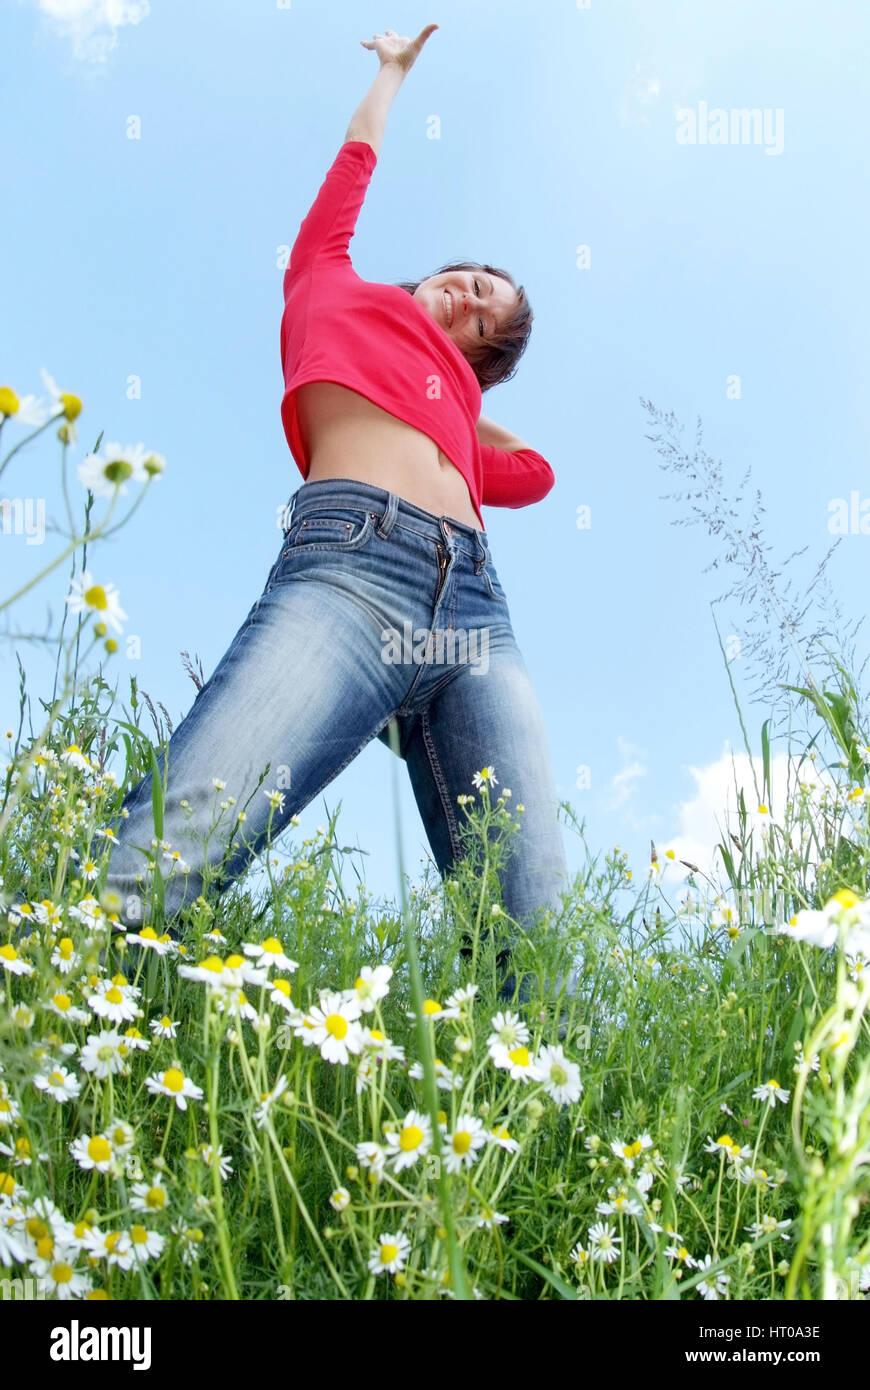 Gut gelaunte, junge Frau in der Wiese - cheerful woman in meadow - Stock Image